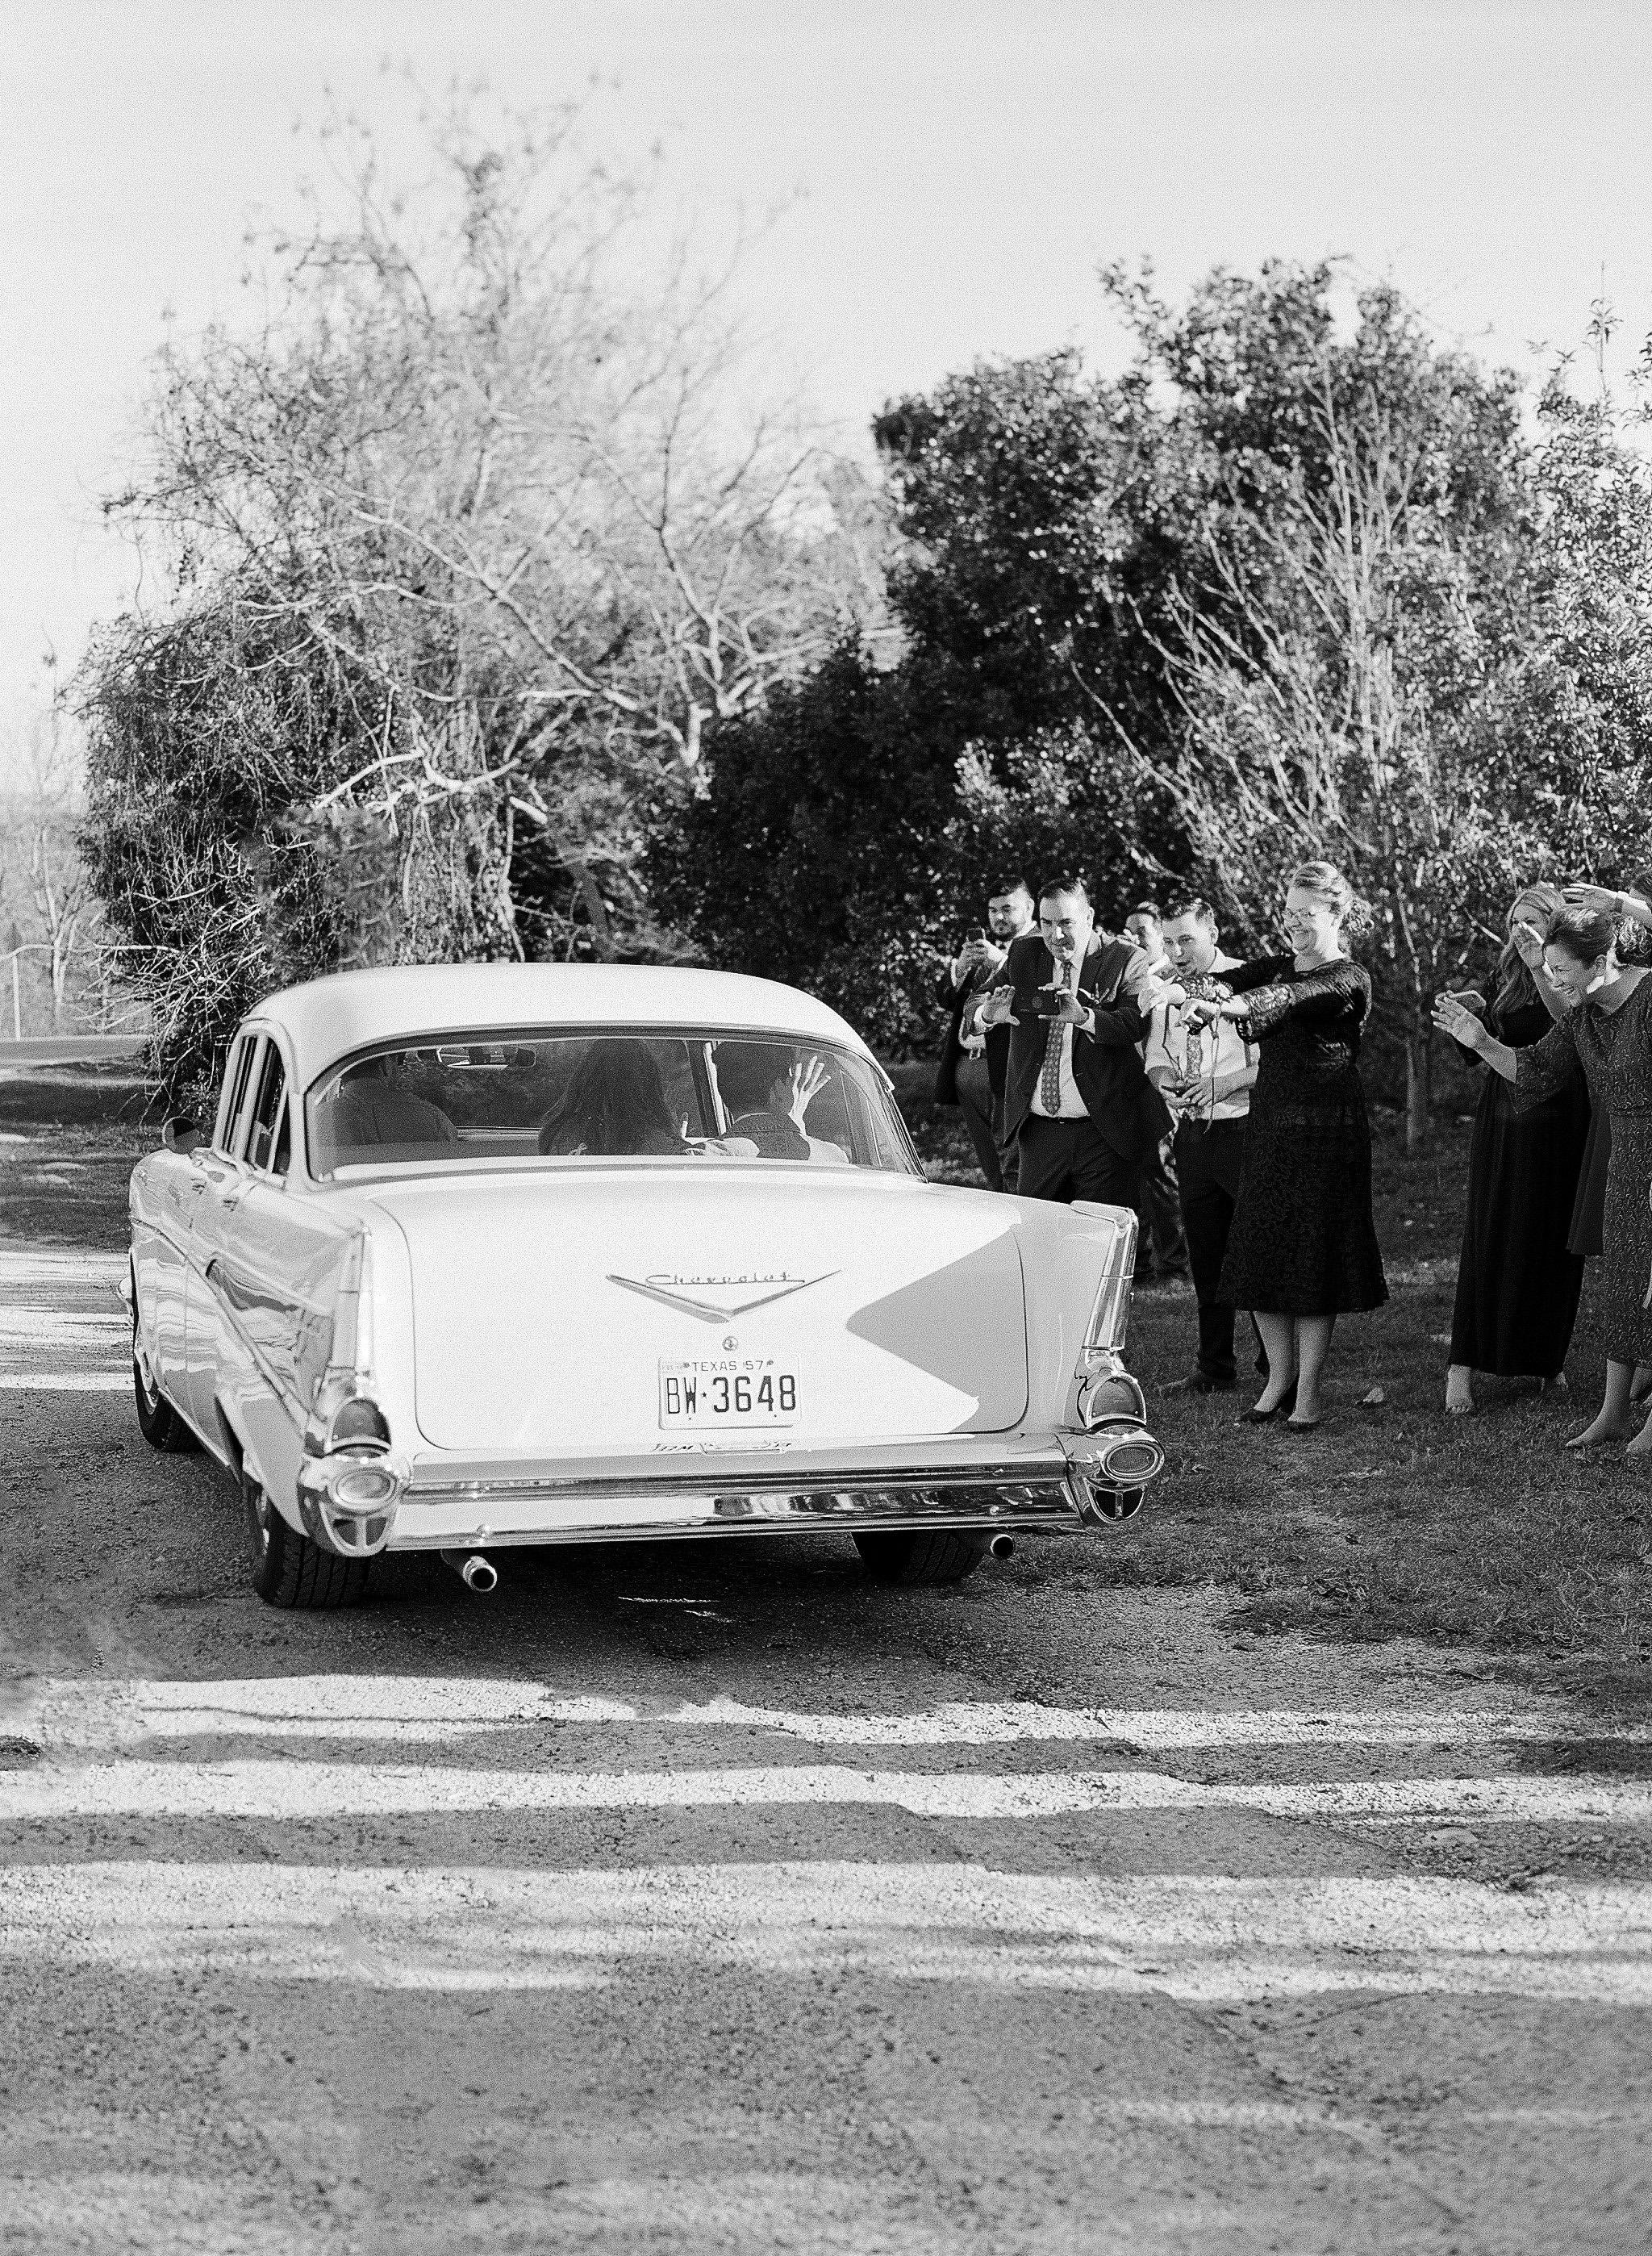 hayleigh corey wedding vintage getaway car